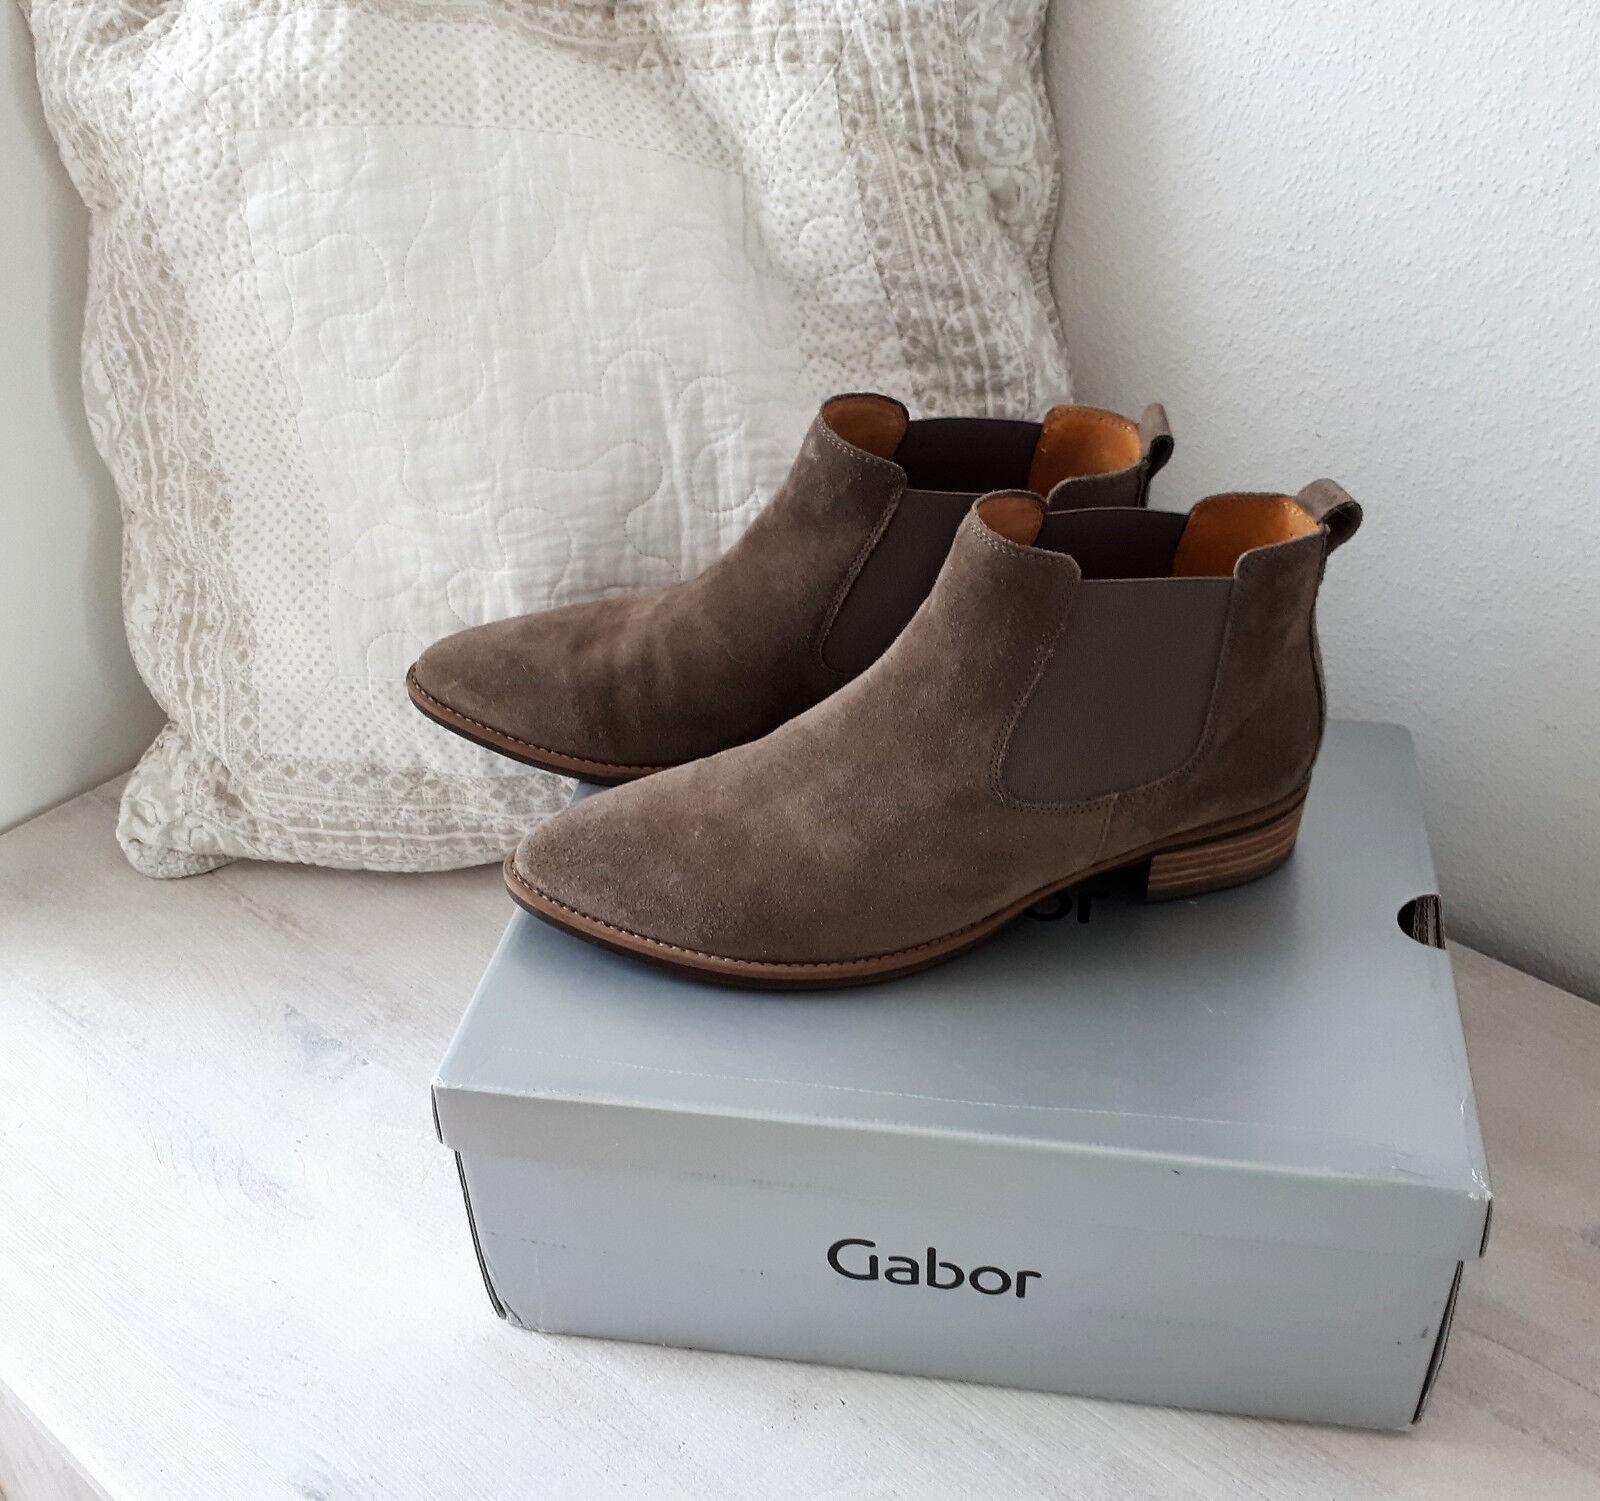 GABOR Bootie Ankle Chelsea Stiefelette taupe Leder 40 -  6 1/2 Leder Schuhe